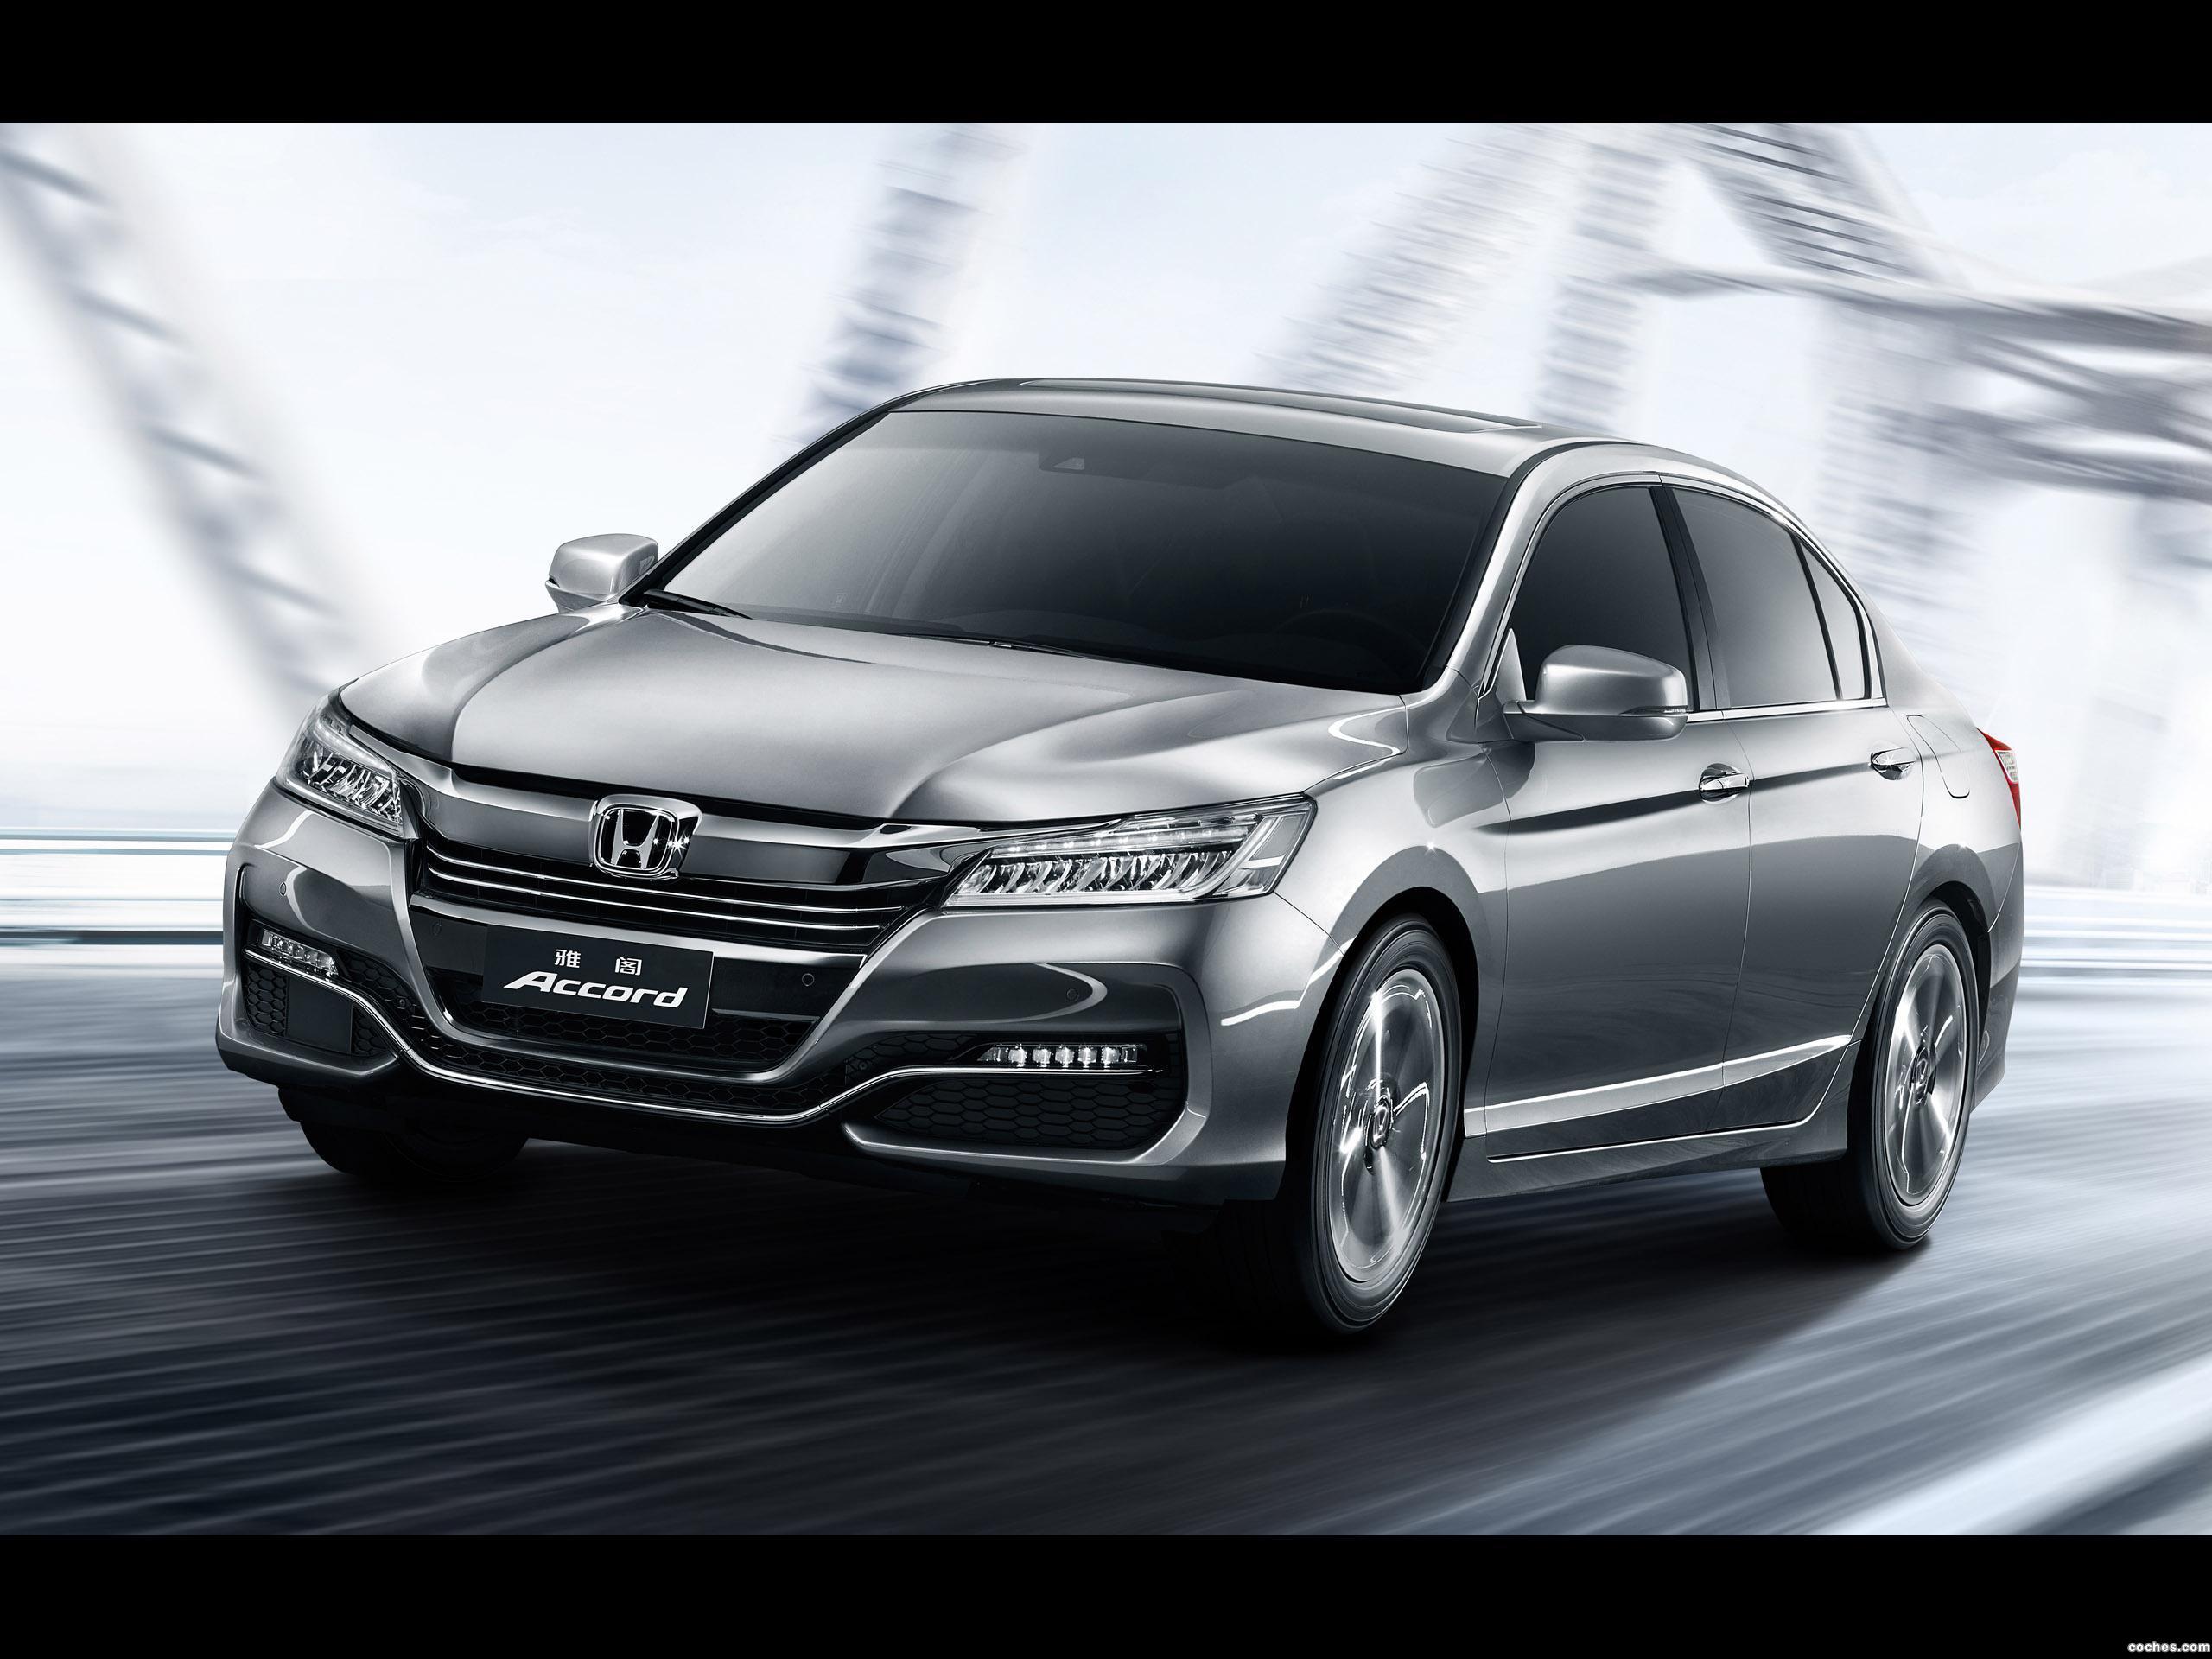 honda_accord-sedan-china-2016_r6.jpg